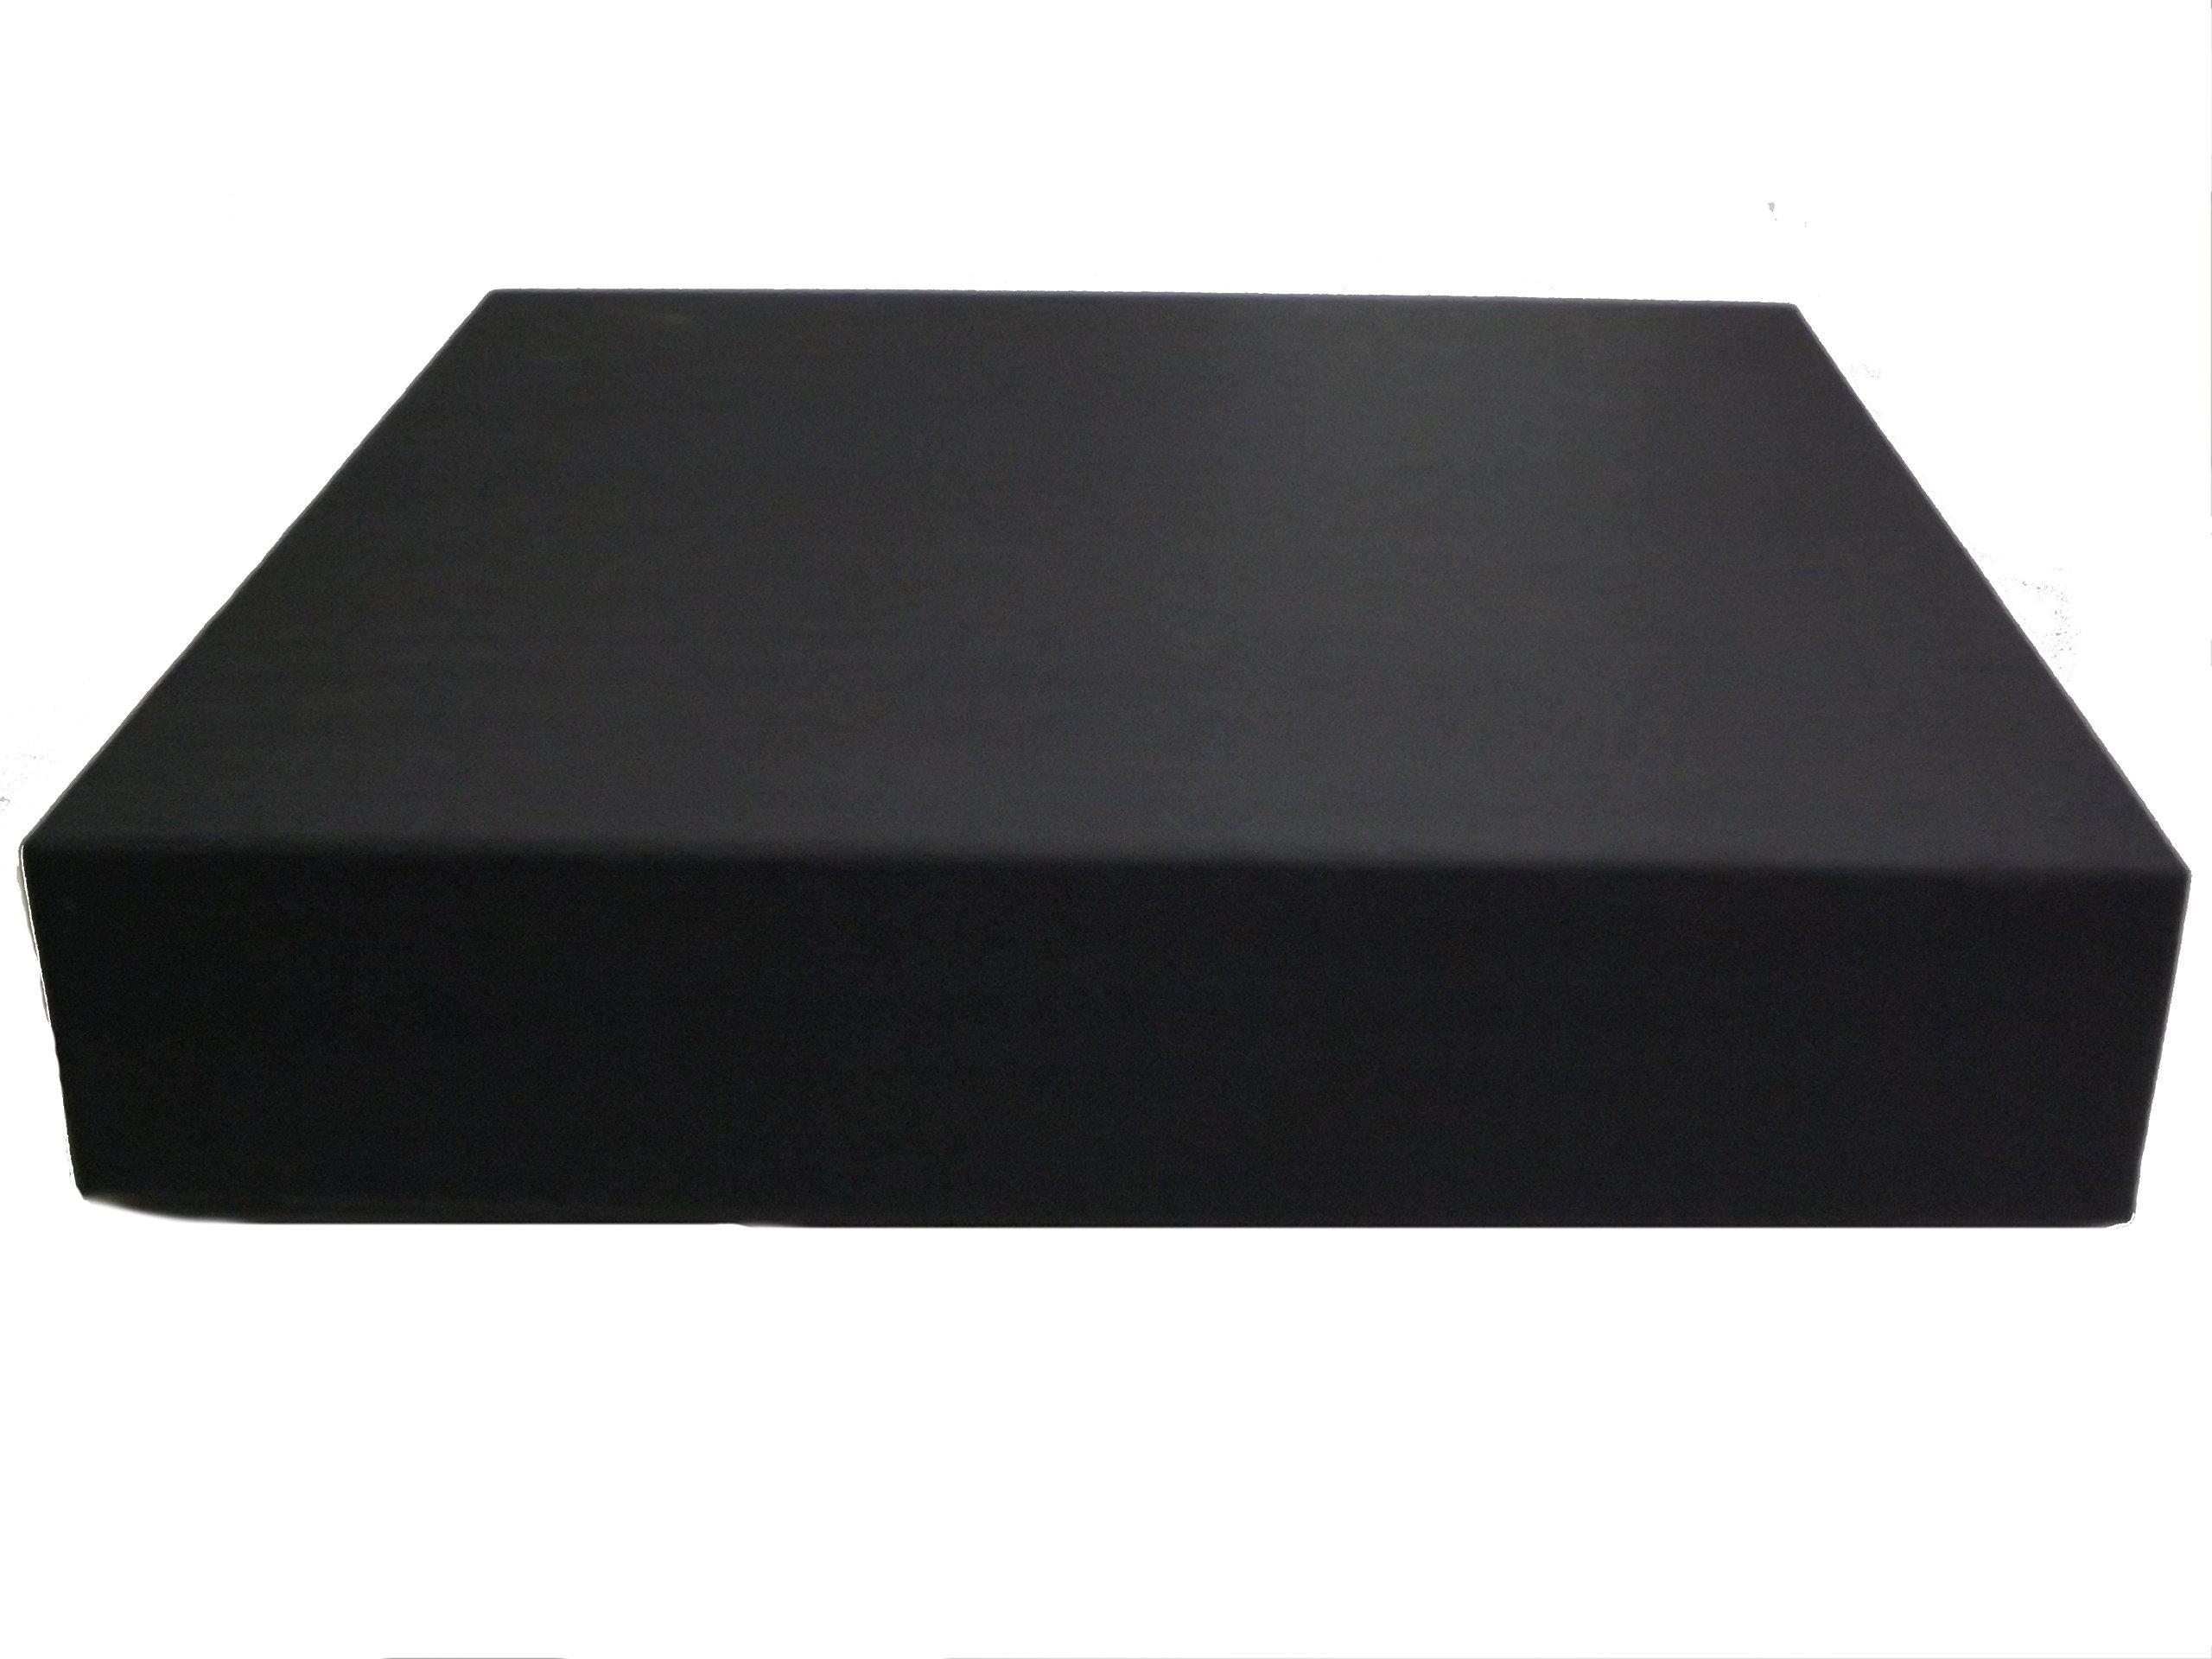 Showoff Albums 10X10 ALBUM BOX/GIFT BOX (2.5'' DEPTH), BLACK (SET OF 12)